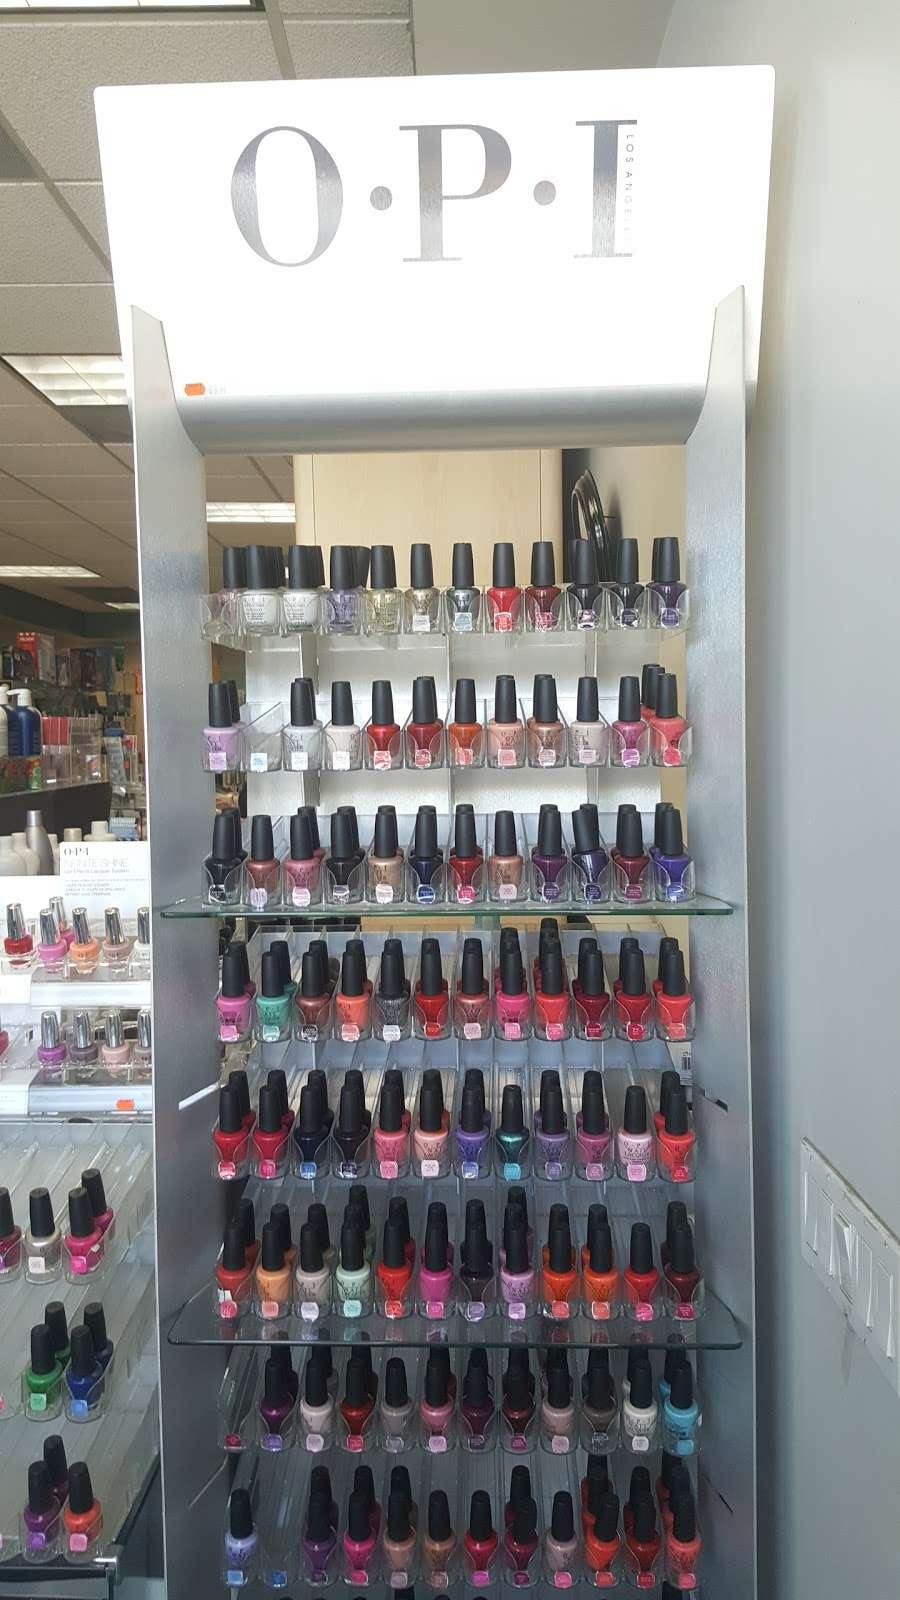 Helens Beauty Supply & Salon - hair care  | Photo 6 of 9 | Address: 15760 La Forge St, Whittier, CA 90603, USA | Phone: (562) 943-7313